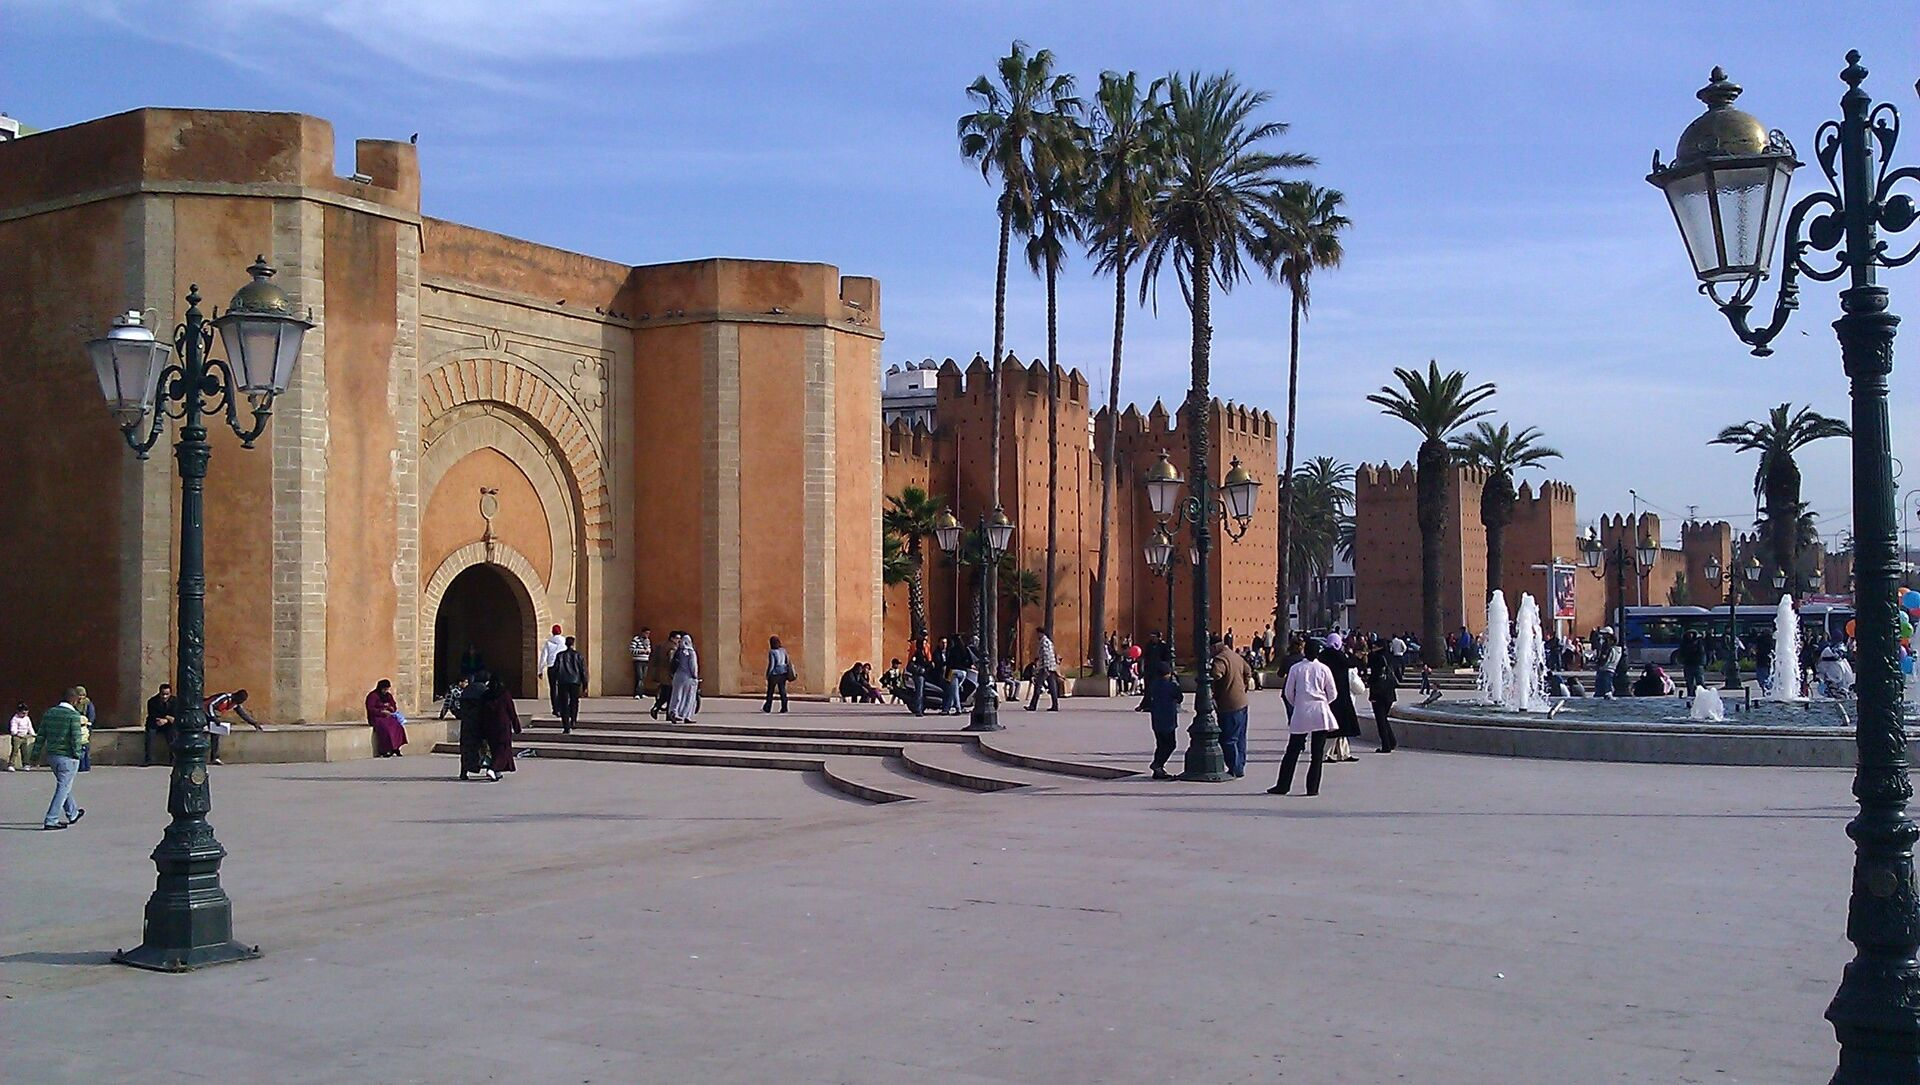 Rabat, Maroc - Sputnik France, 1920, 11.08.2021